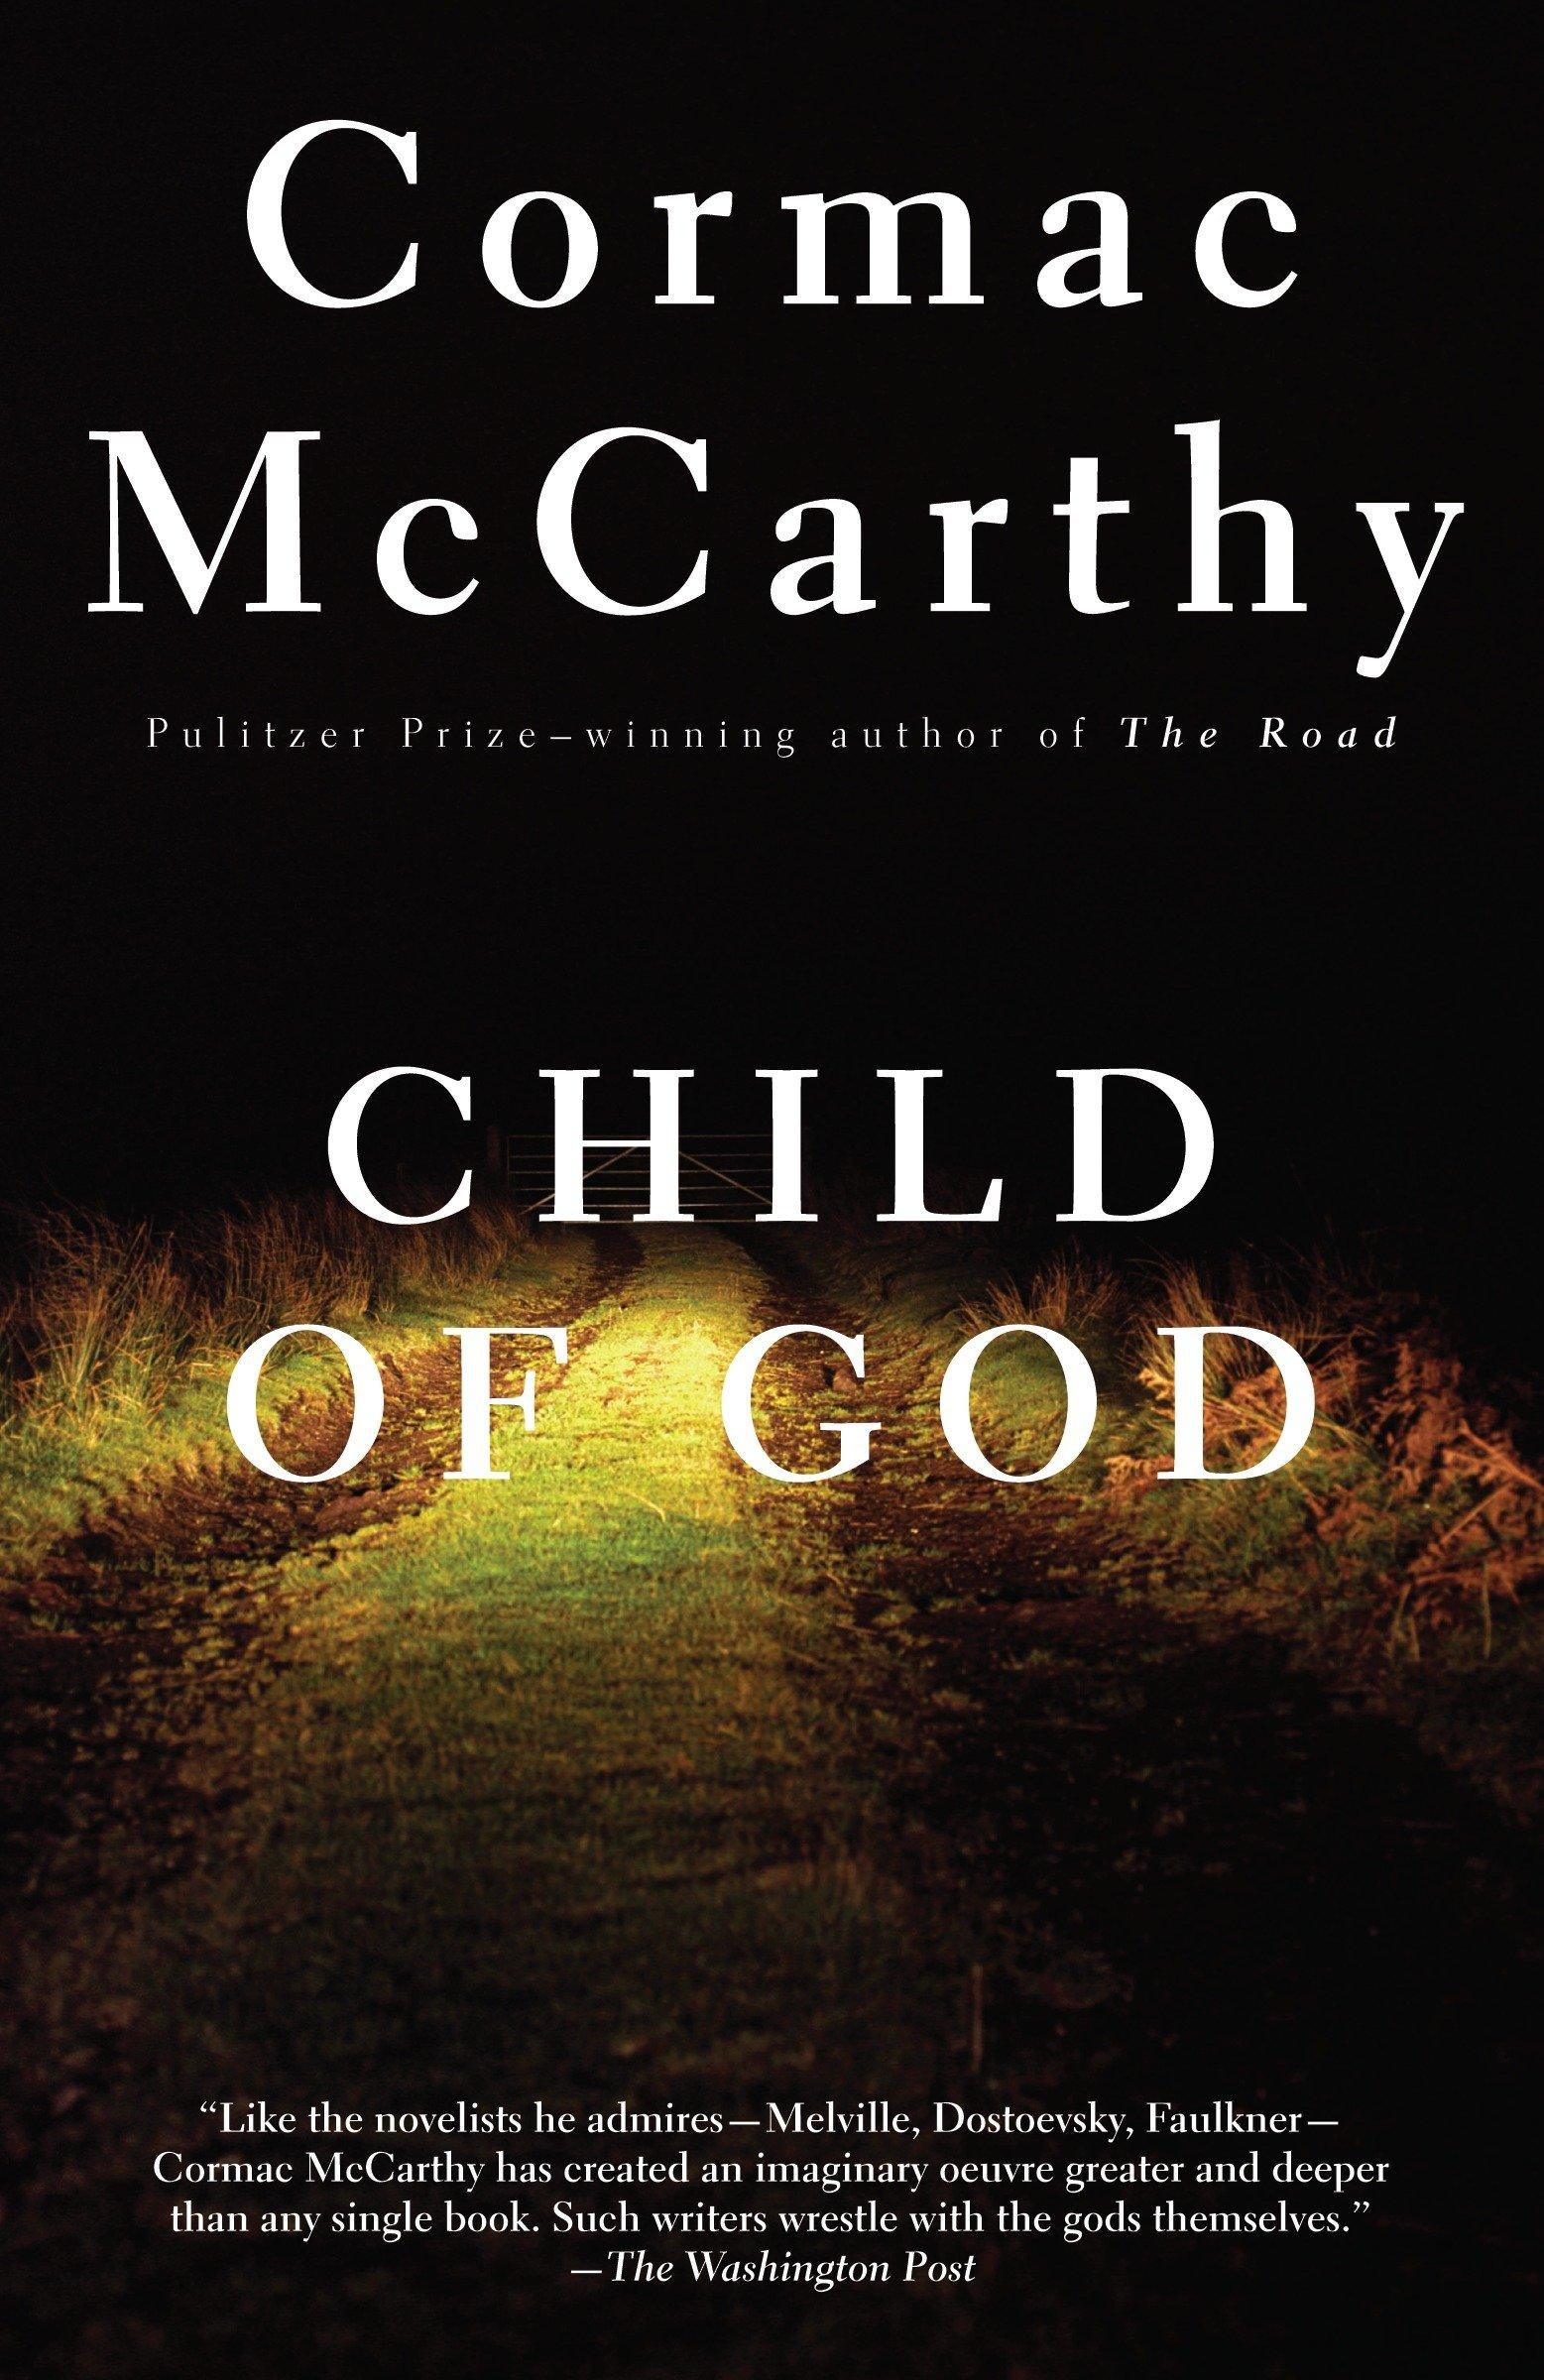 Child of God: Cormac McCarthy: 9780679728740: Amazon.com: Books